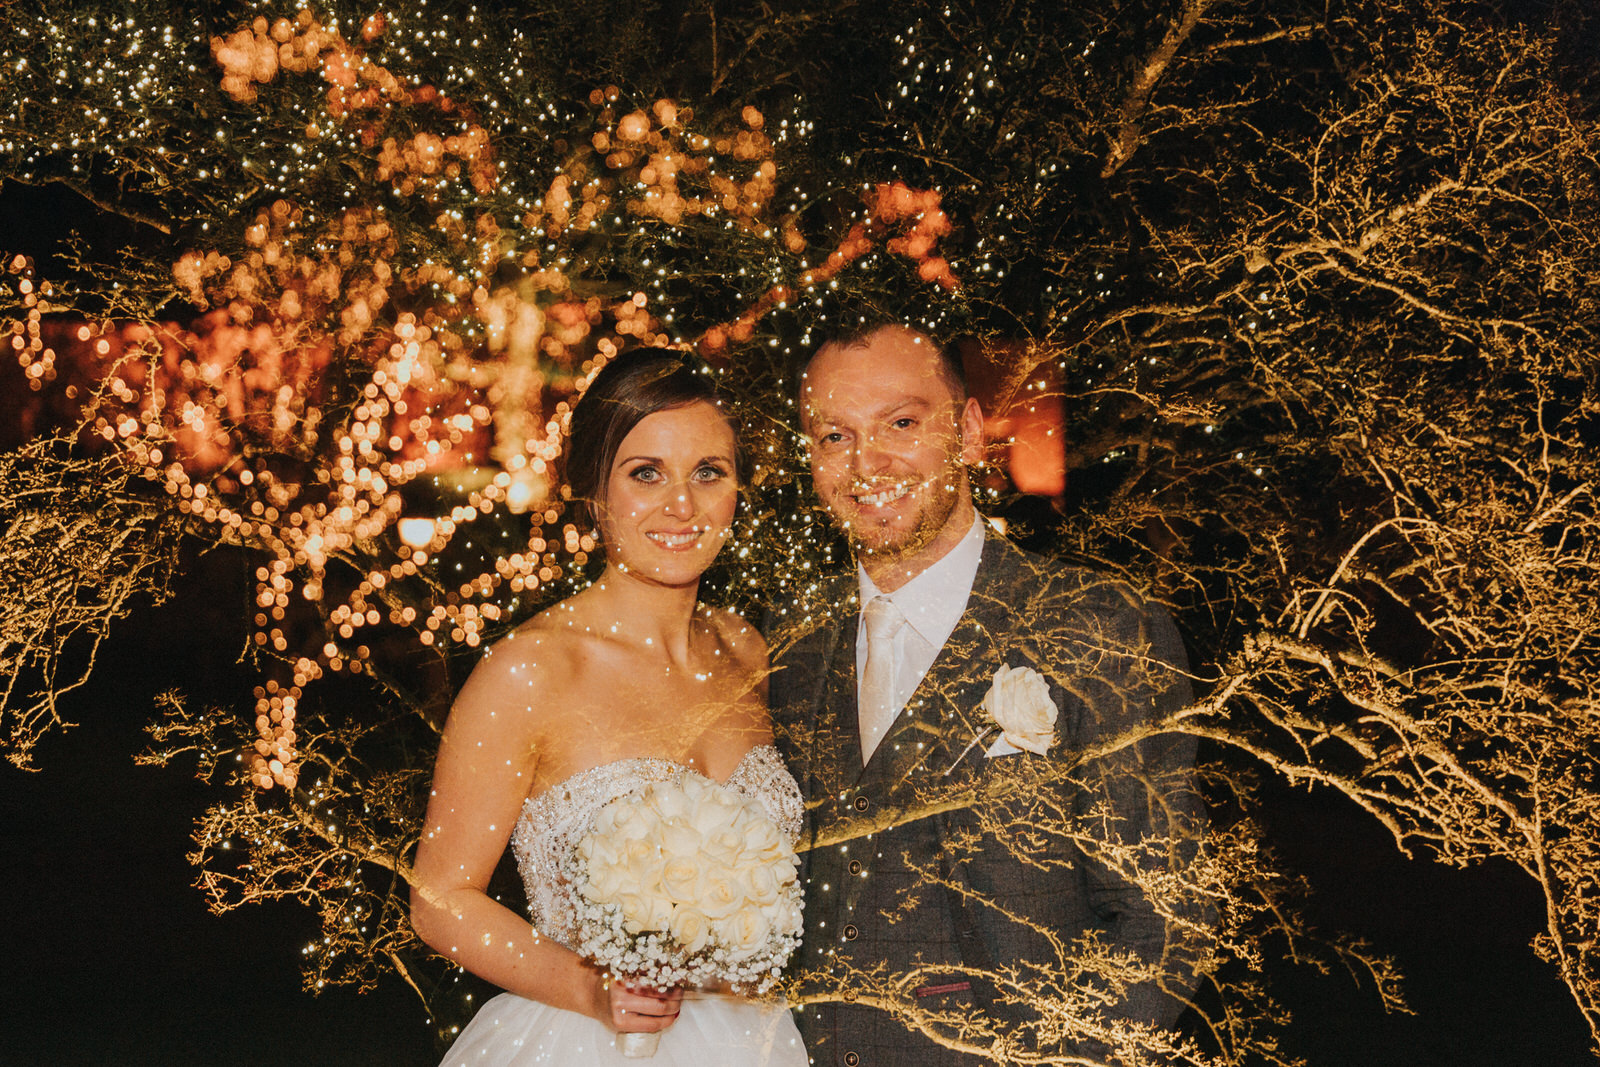 Clonabreany_wedding-photographer_roger_kenny_ireland_100.jpg